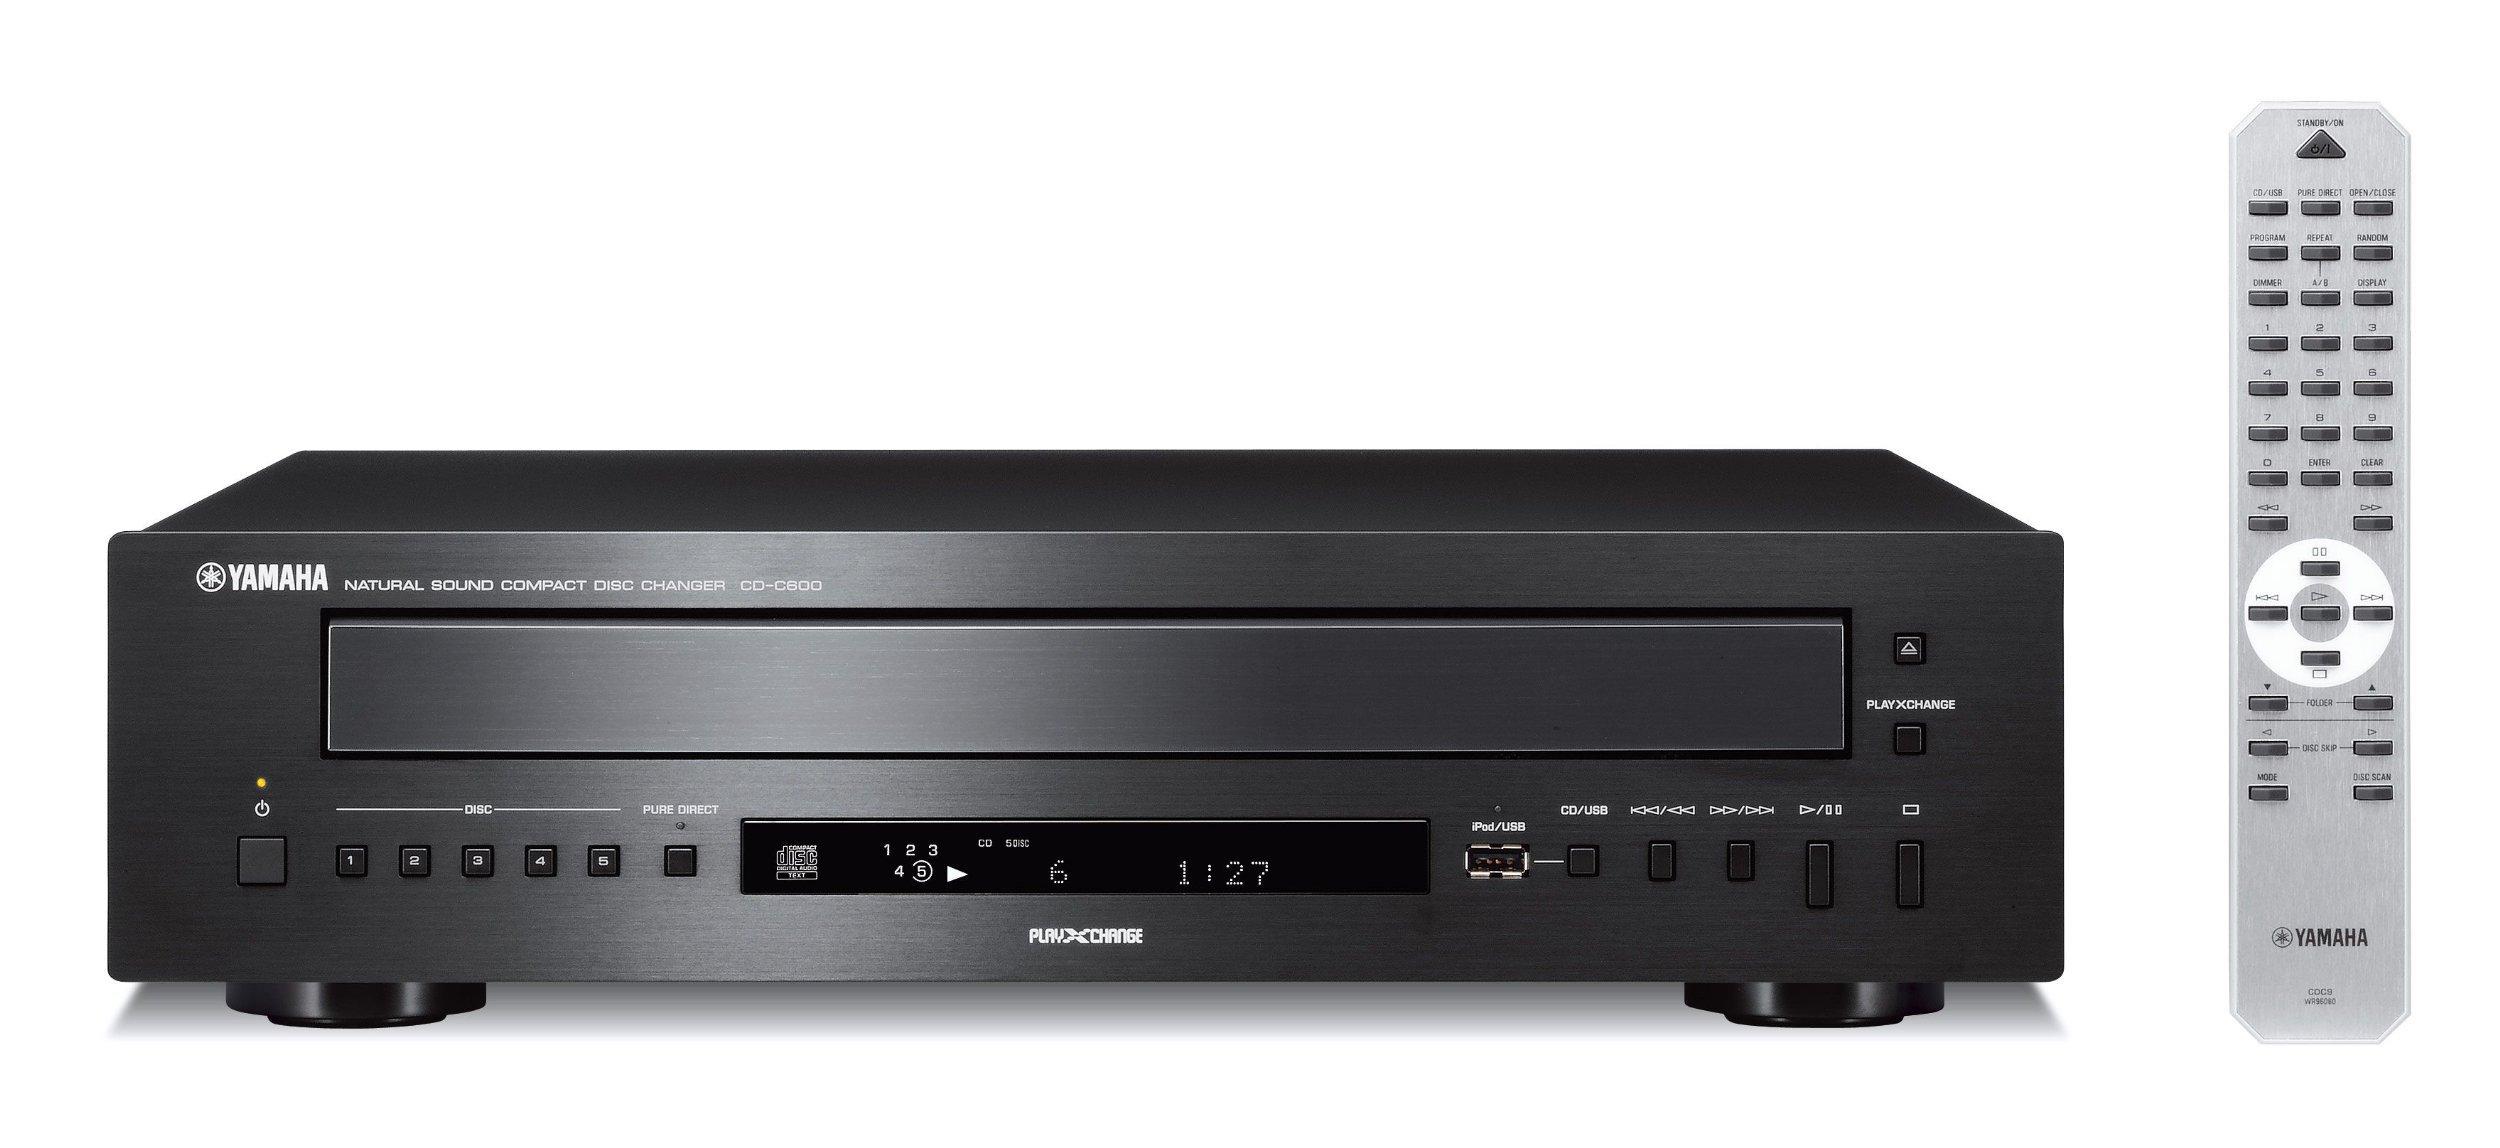 Yamaha CD-C600BL 5-Disc CD Changer Black (Renewed) by Yamaha Audio